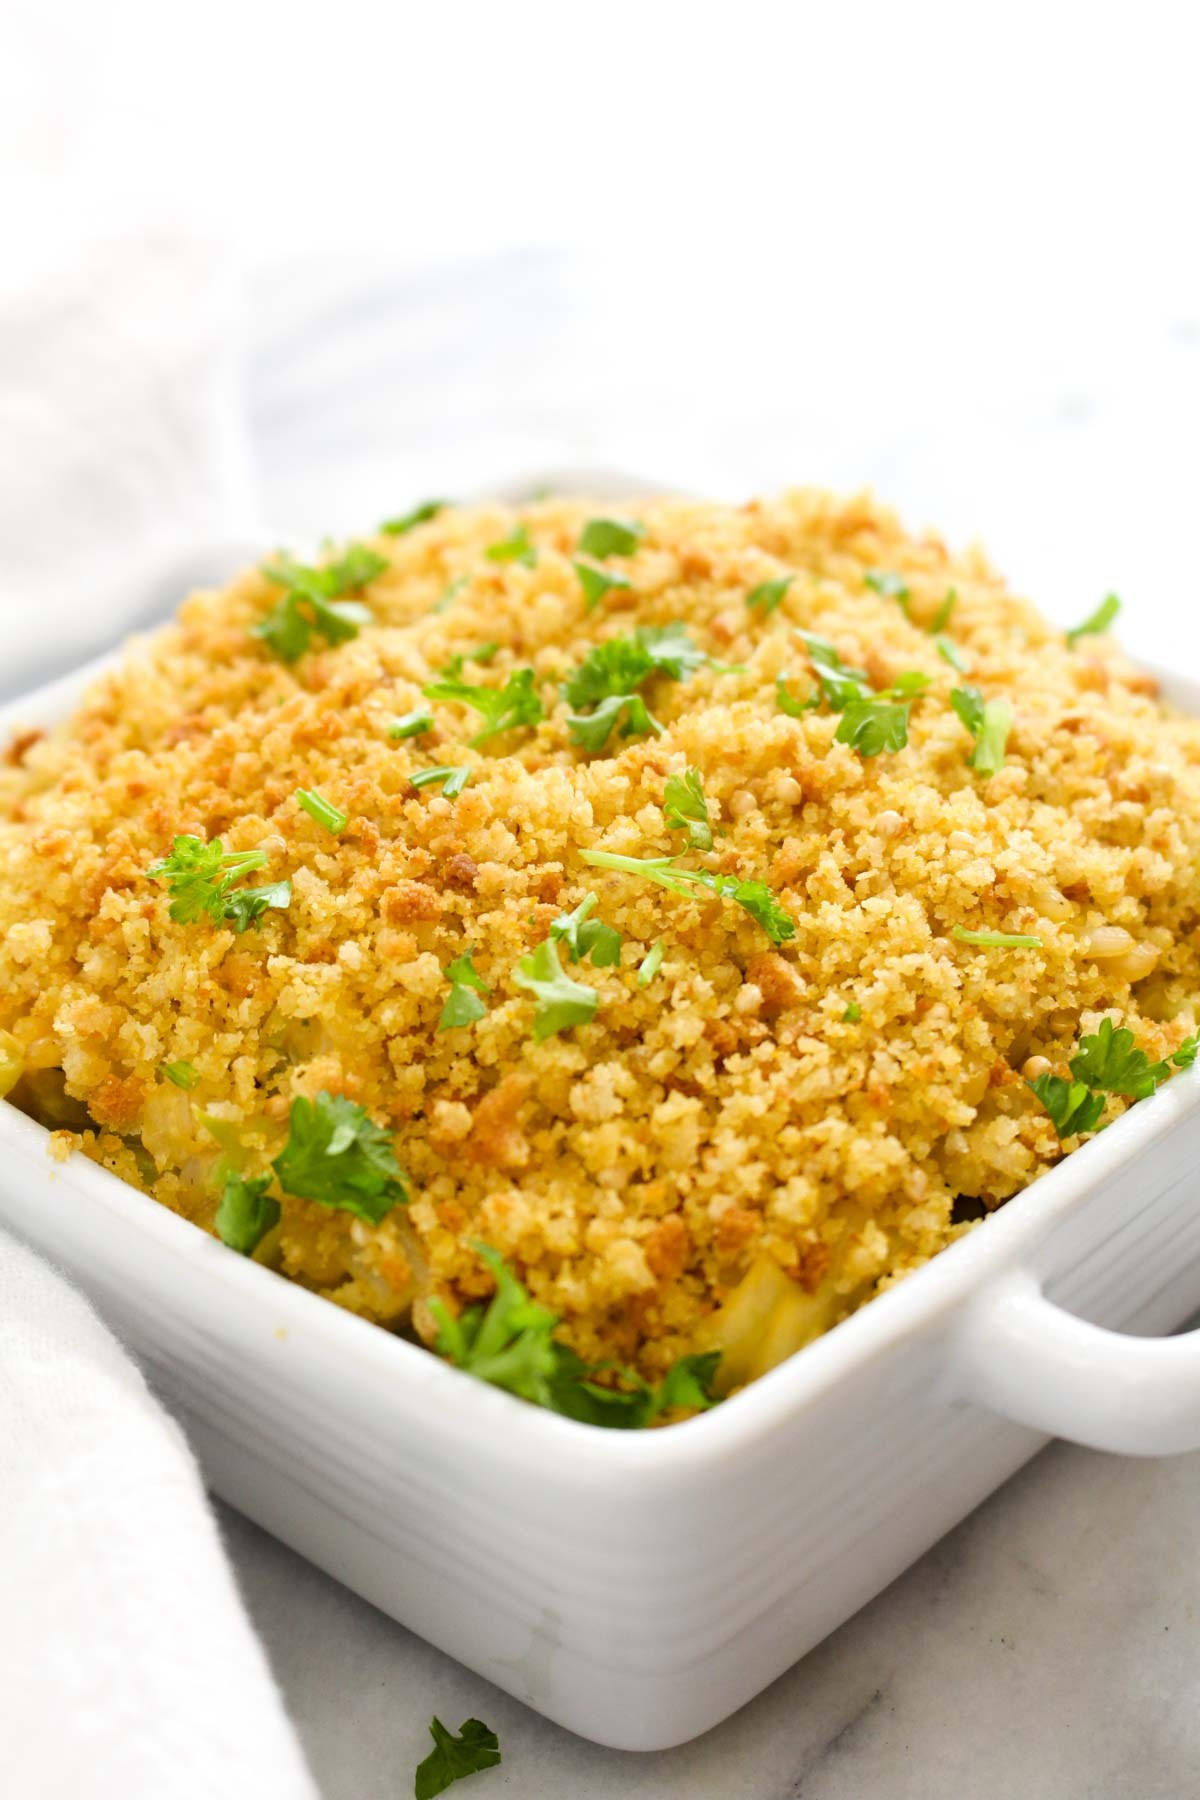 Healthy Broccoli Rice Casserole  Vegan Cheesy Broccoli Rice Casserole Catching Seeds